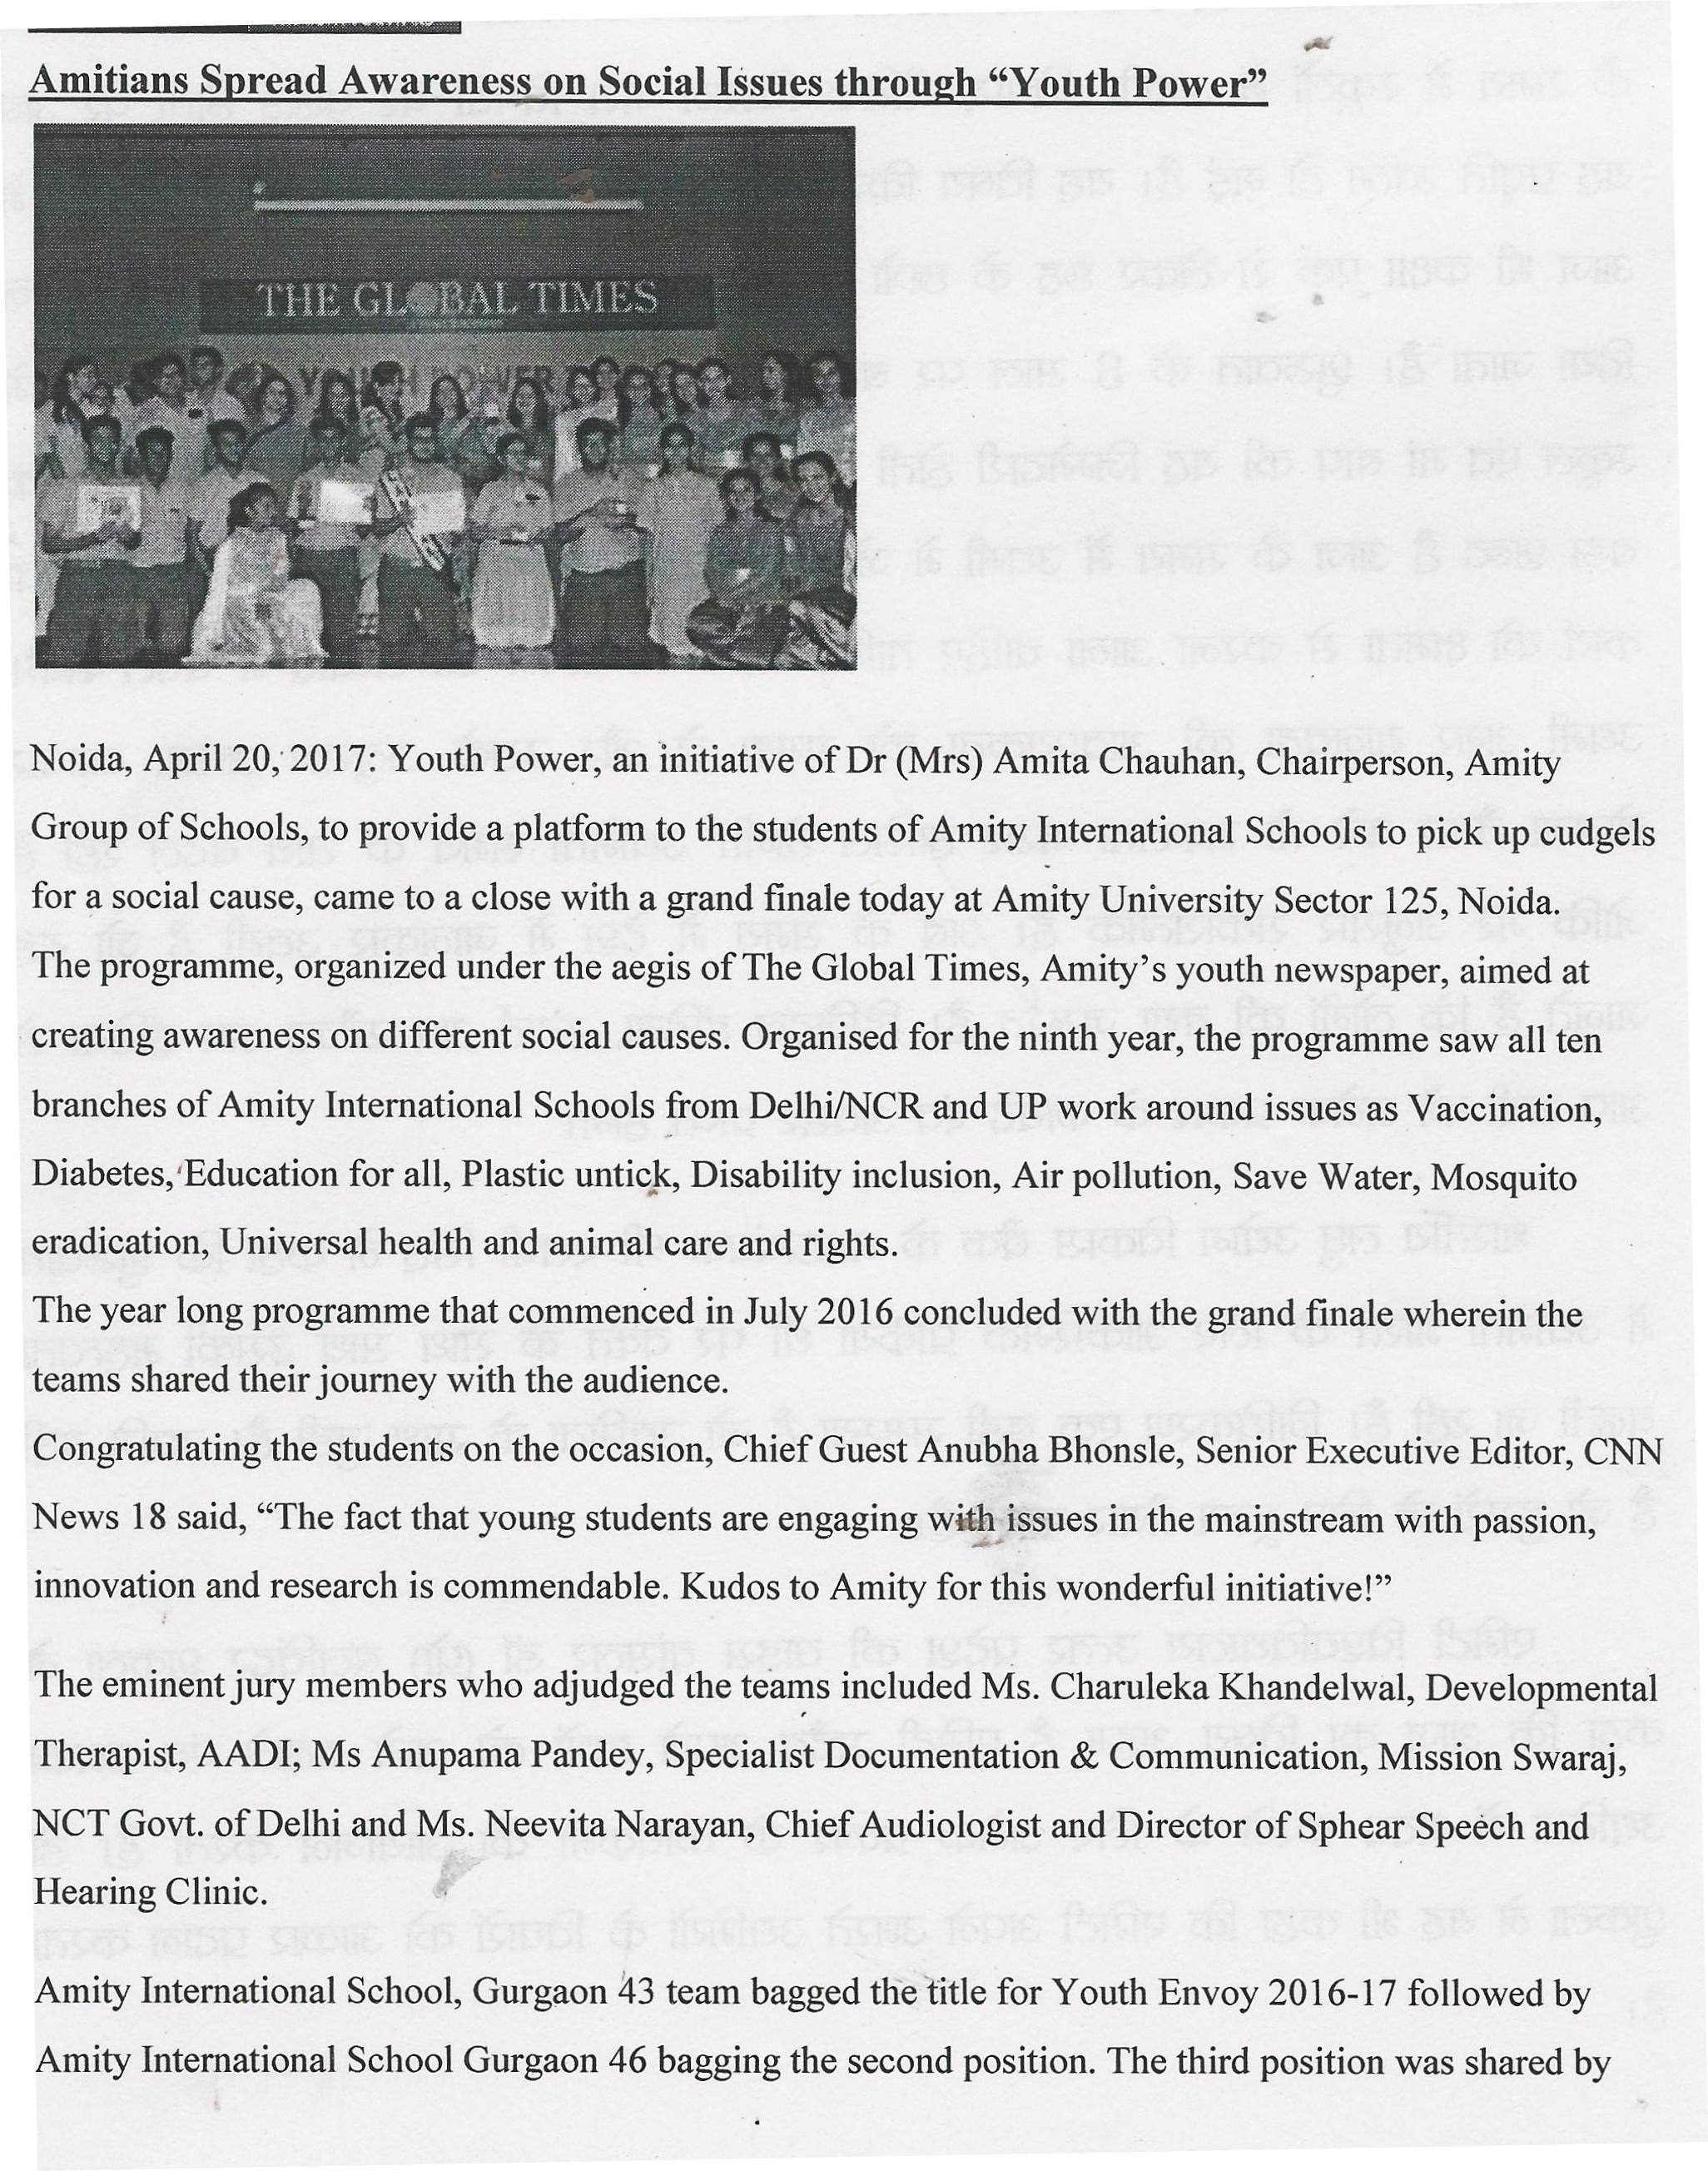 Amity International School Gurgaon Sector 43 wins Youth Power 2016-17 - Amity Events